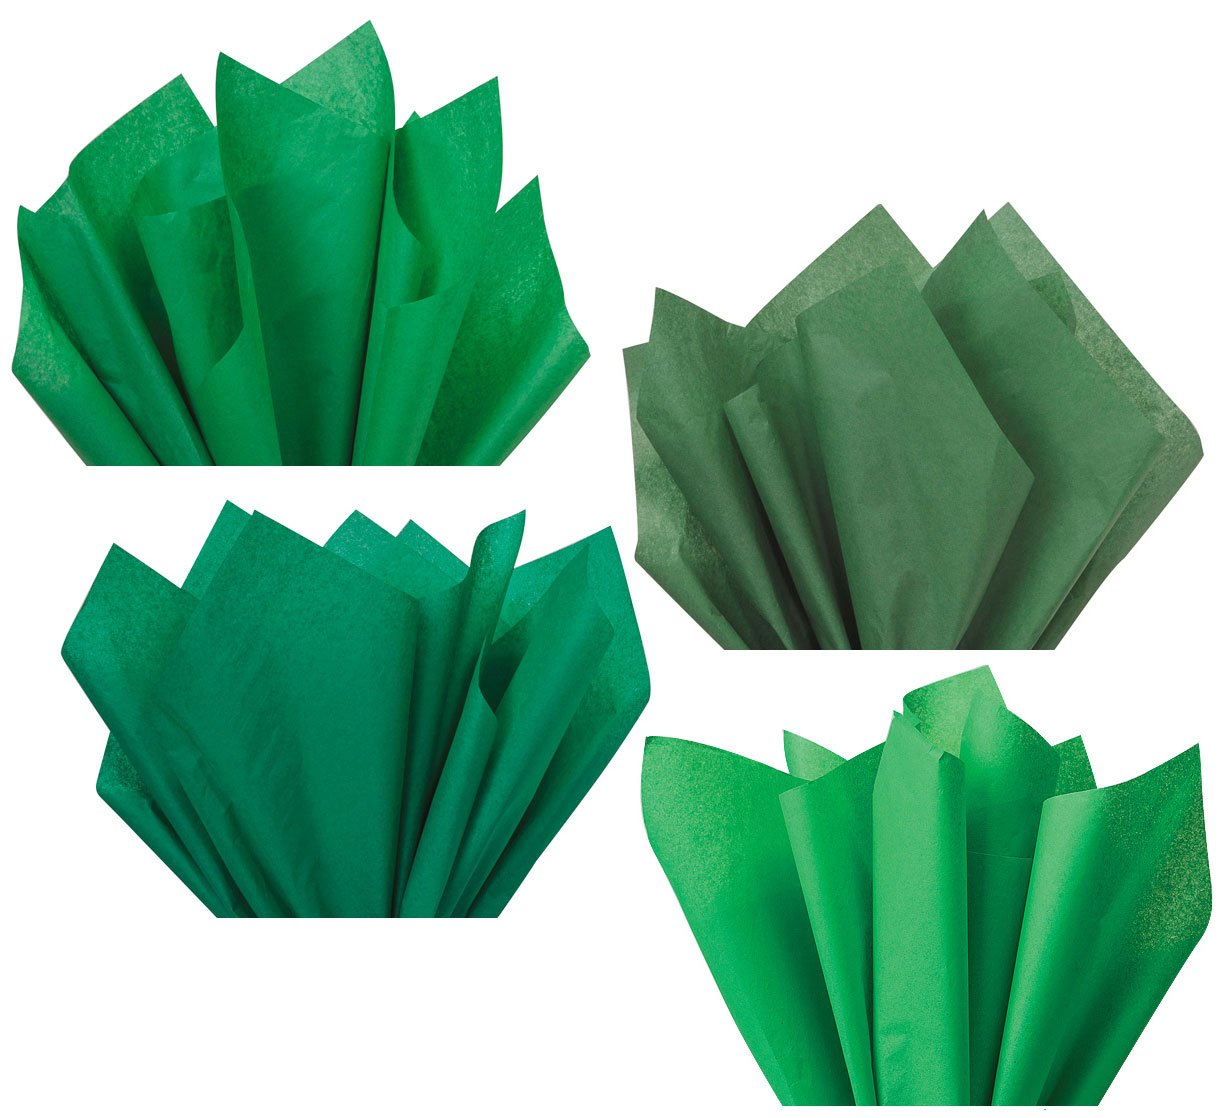 Hunter Ivy Kelly Pine Green Assorted Mixed Color Multi-Pack Tissue Paper for Flower Pom Poms Art Craft Wedding Bridal Shower Party Gift Bag Basket Filler Decoration by Secret for Longevity